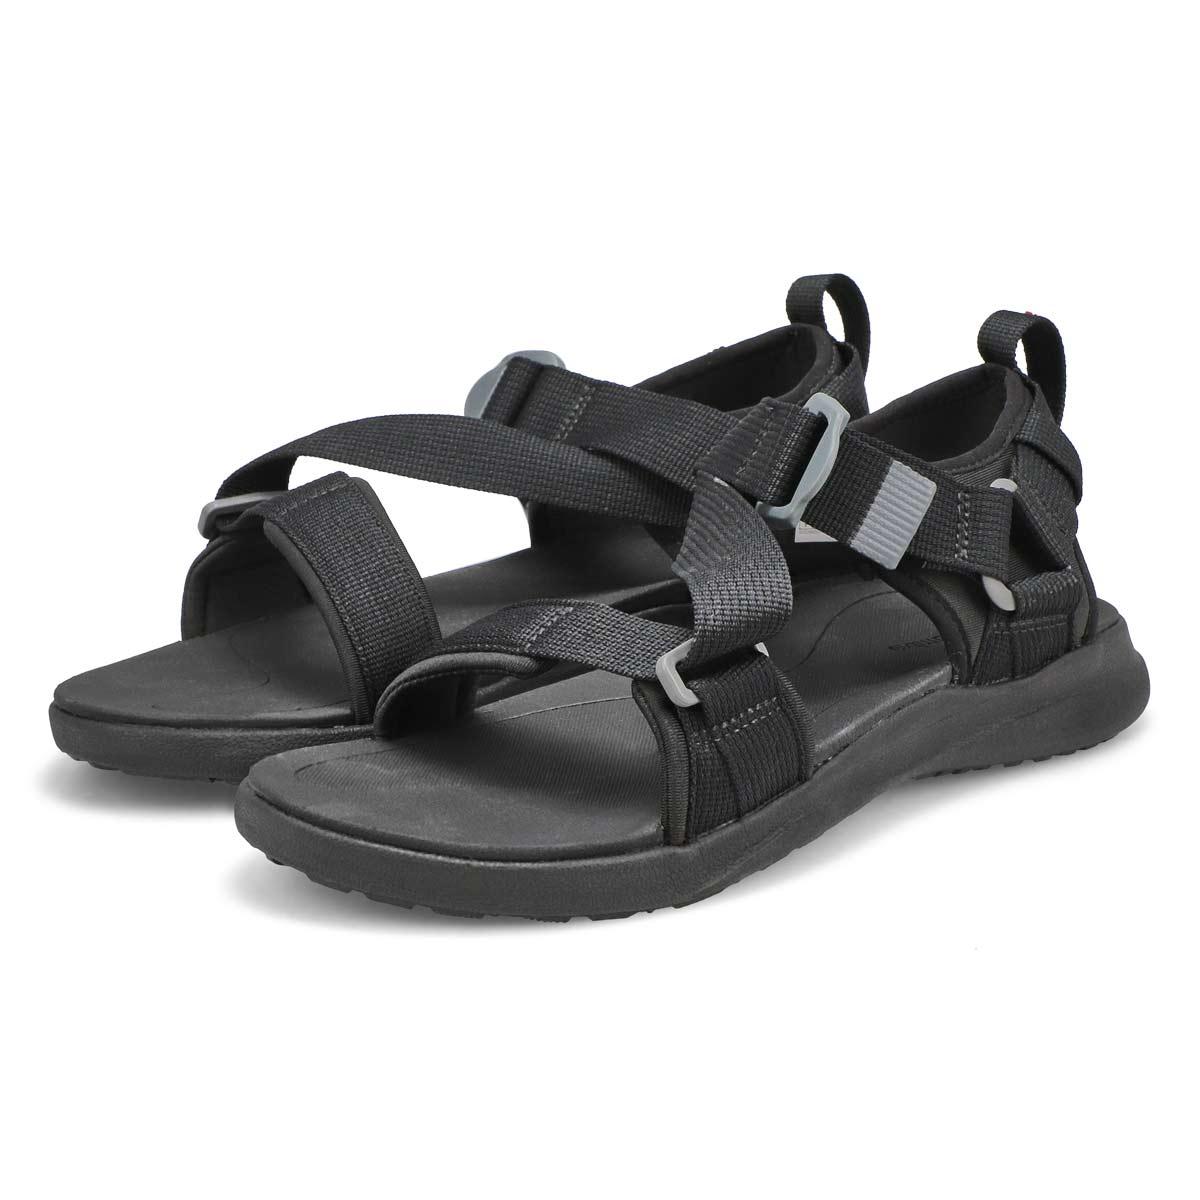 Mns Columbia Sandal blk/rd sport sandal